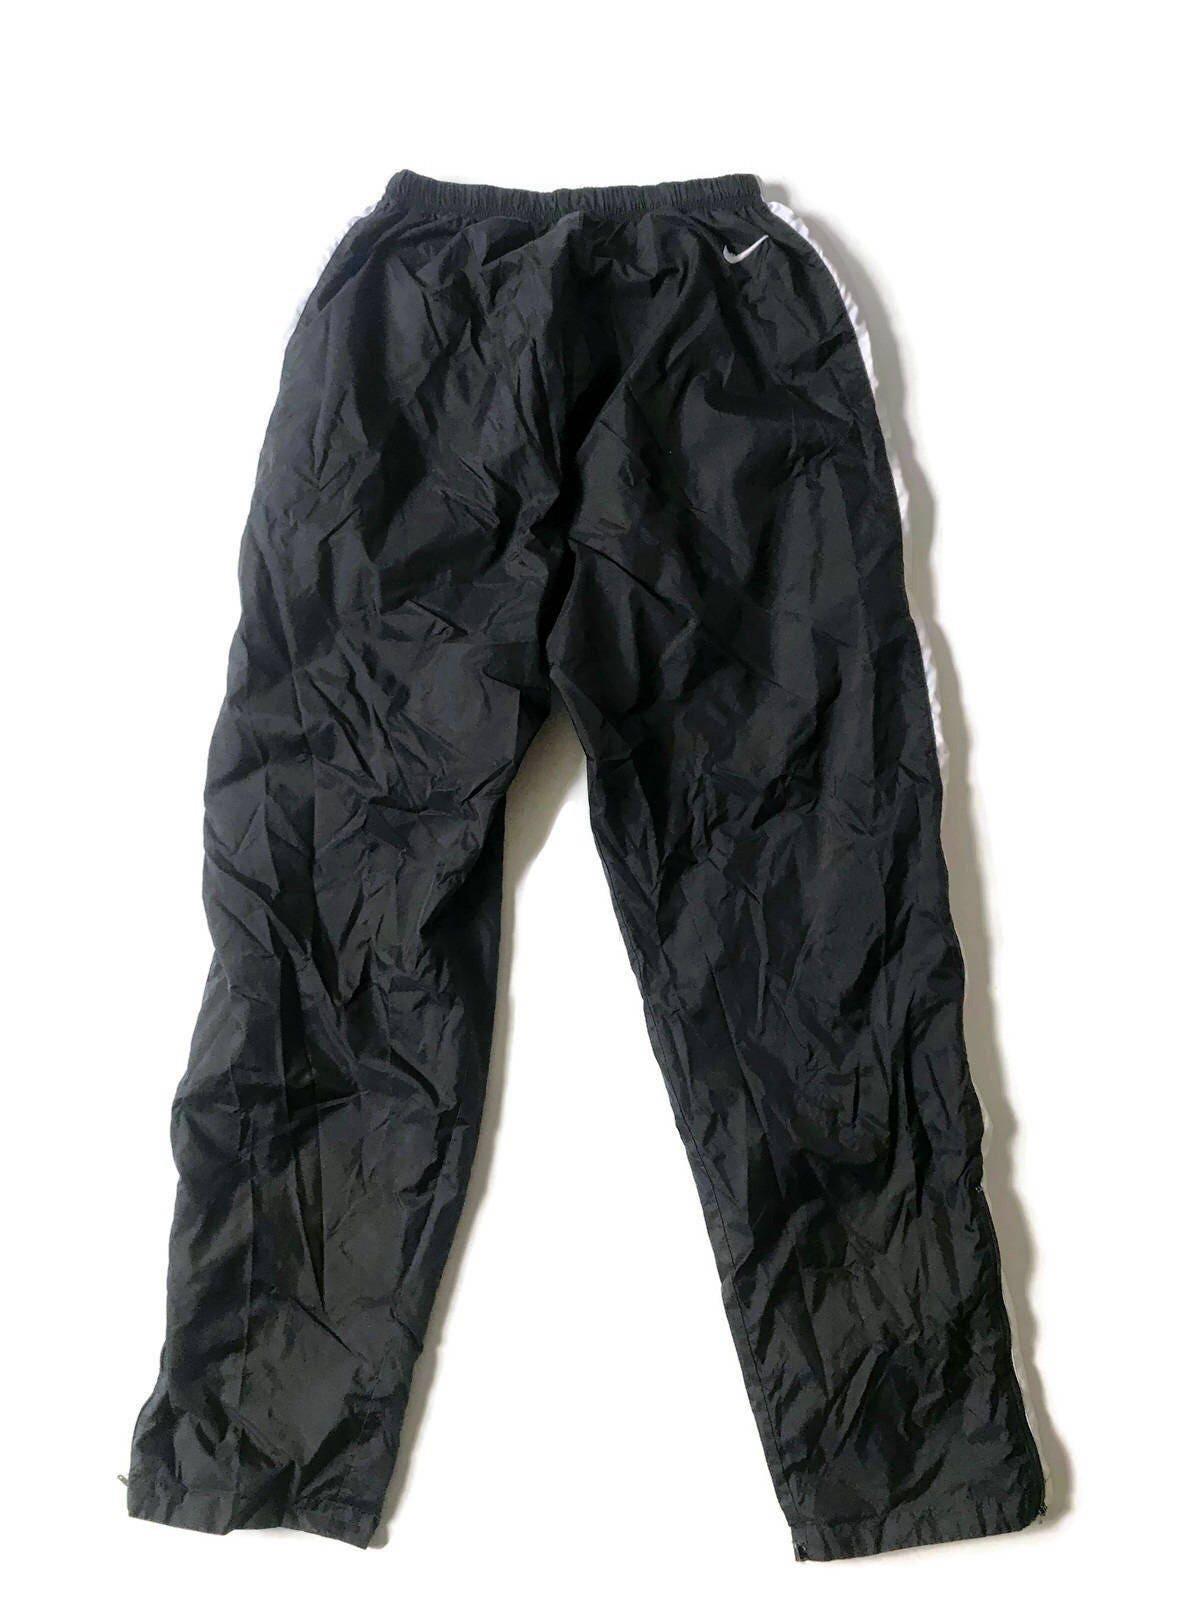 d67a8b829758 Vintage Nike Reversible Sweatpants Windbreaker Pants Nylon Track Running  Womens M